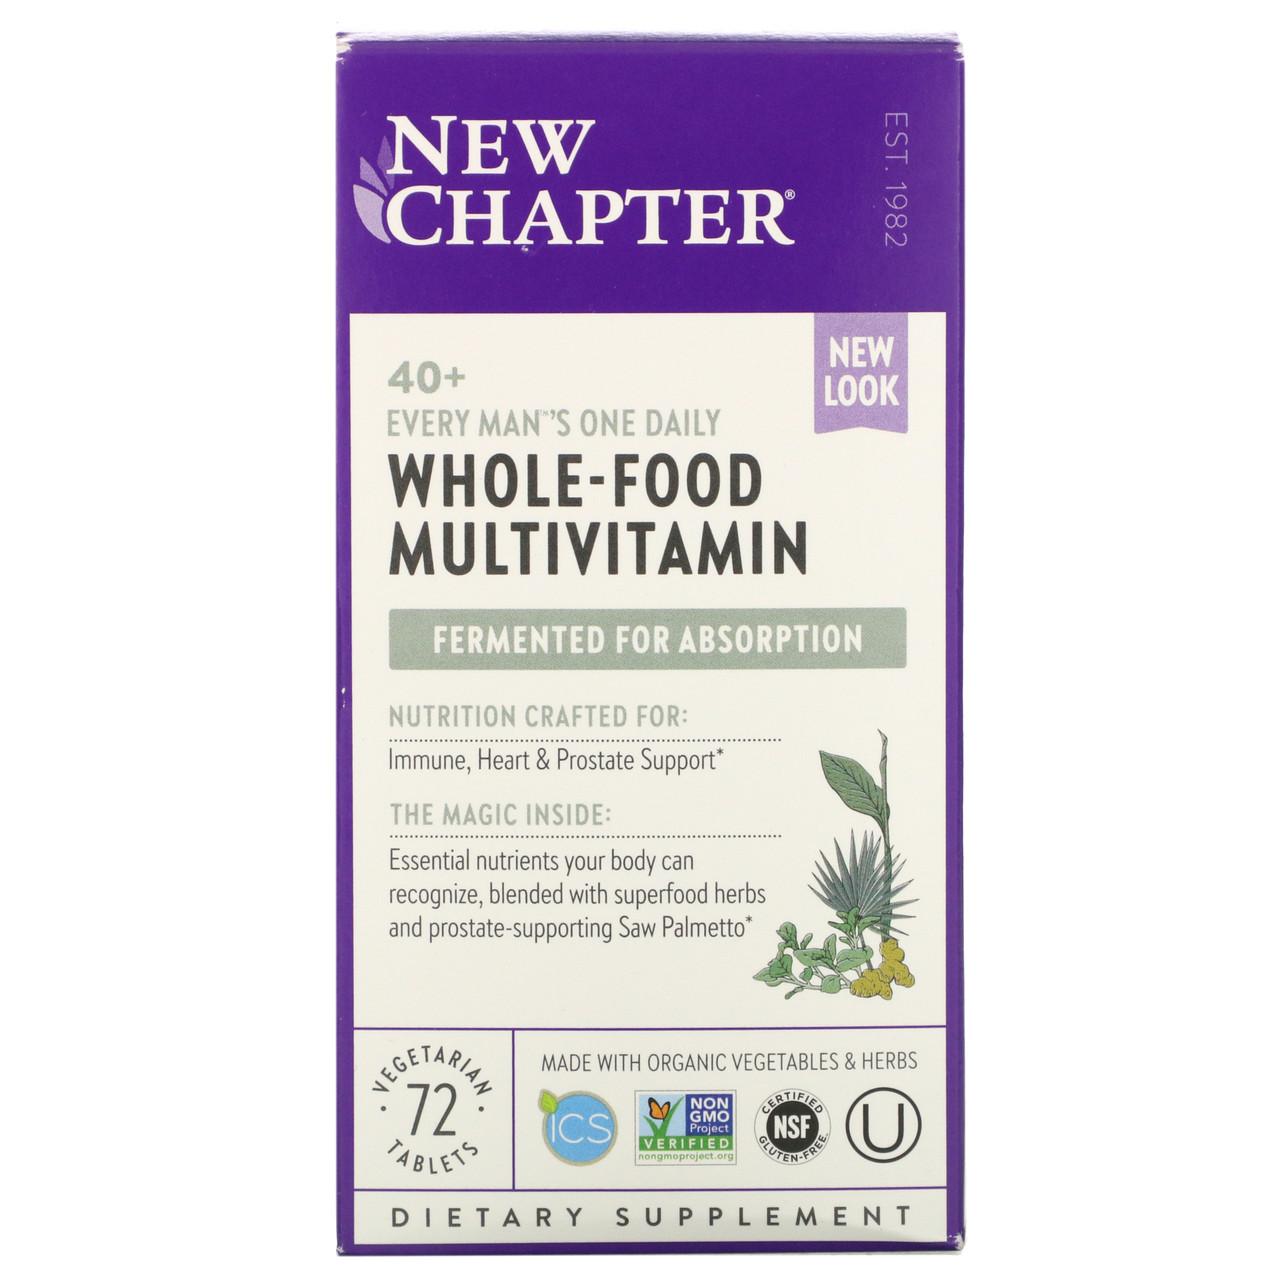 New Chapter, 40+ ежедневный комплекс мультивитиминов для мужчин, 72 таблетки